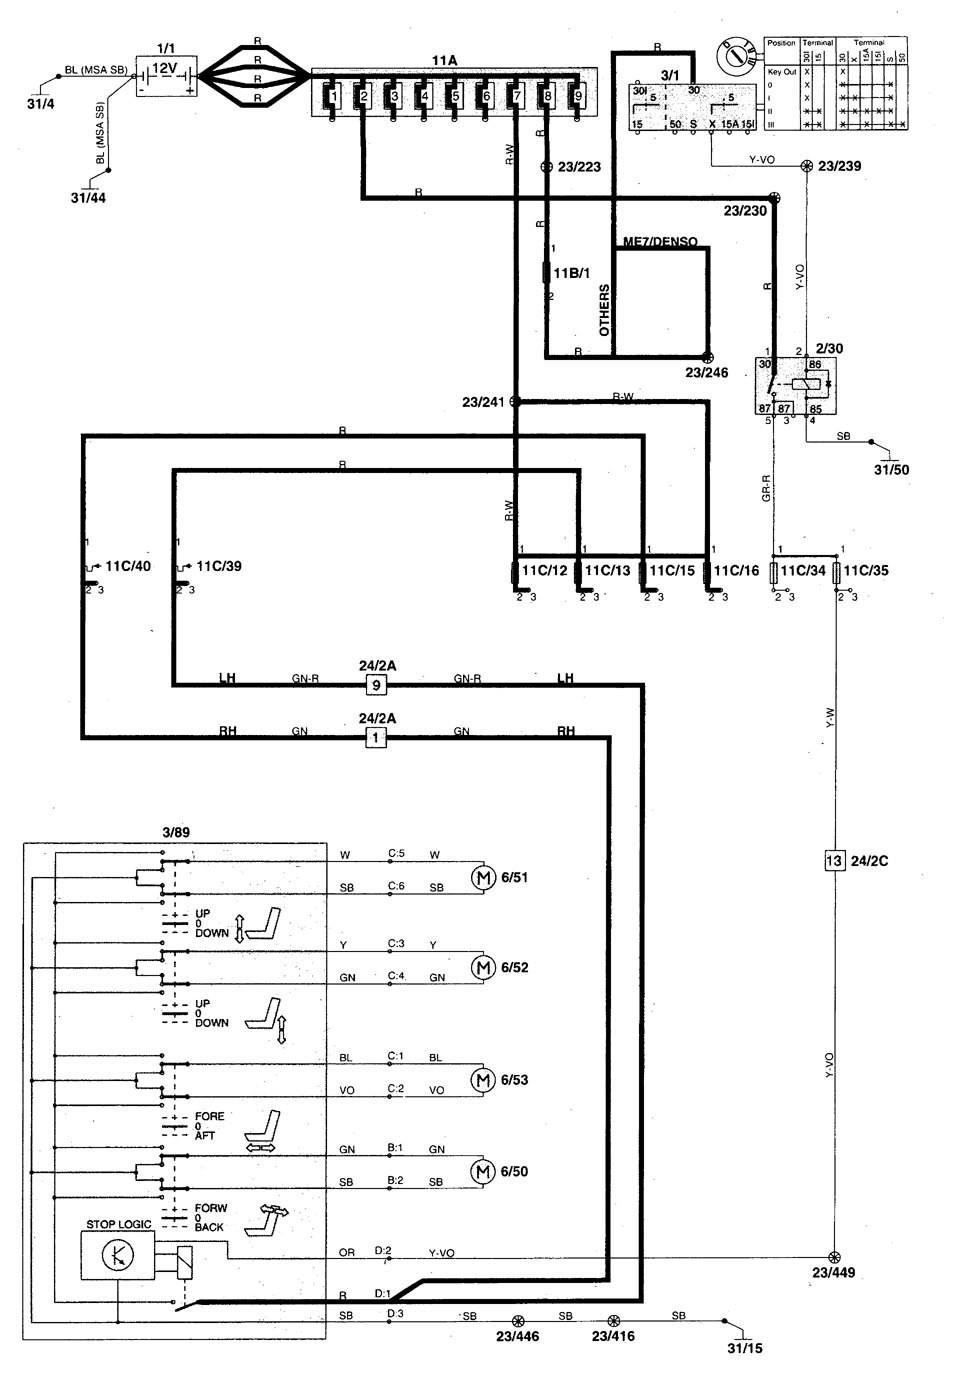 volvo V70 wiring diagram power seat 1 1998